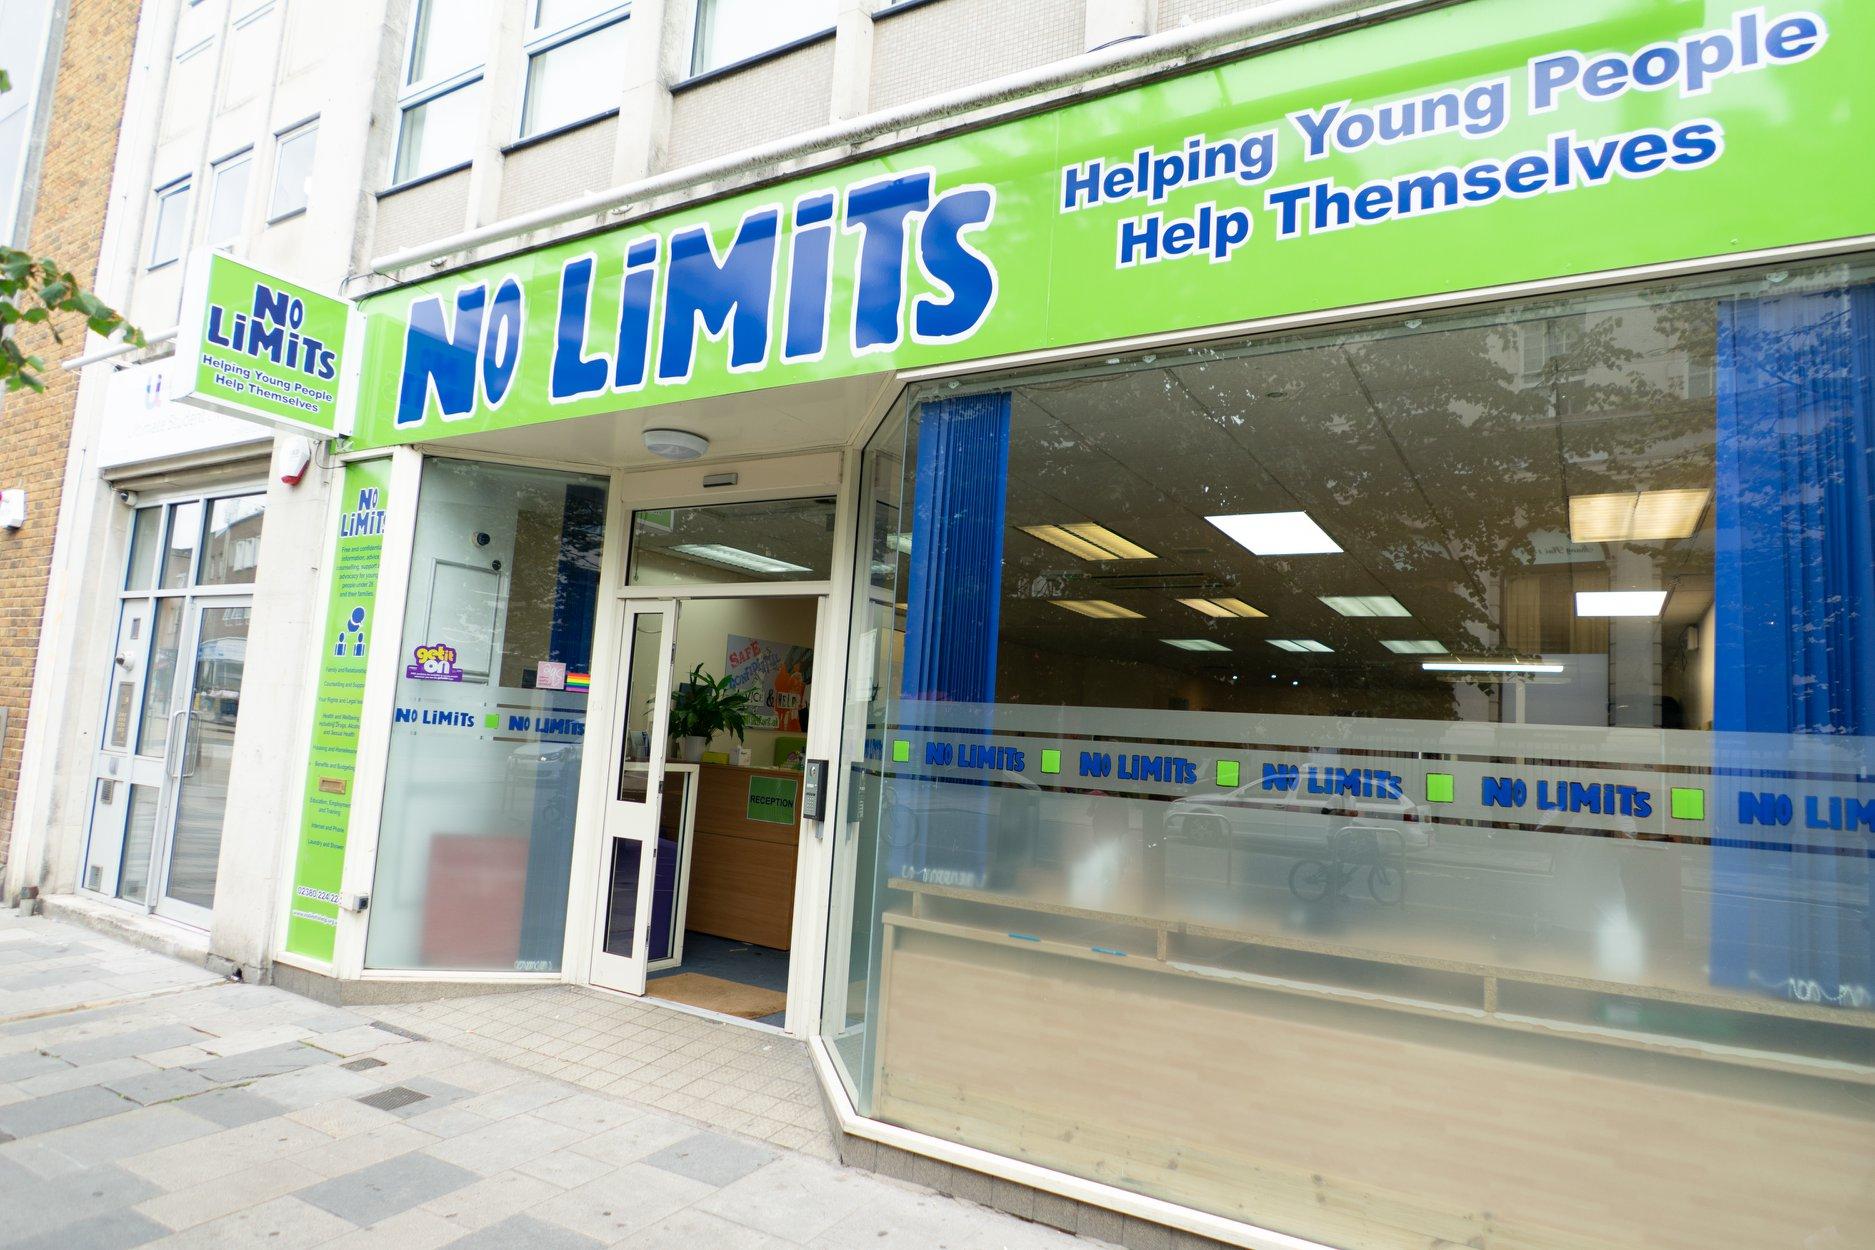 No Limits shop front in Southampton